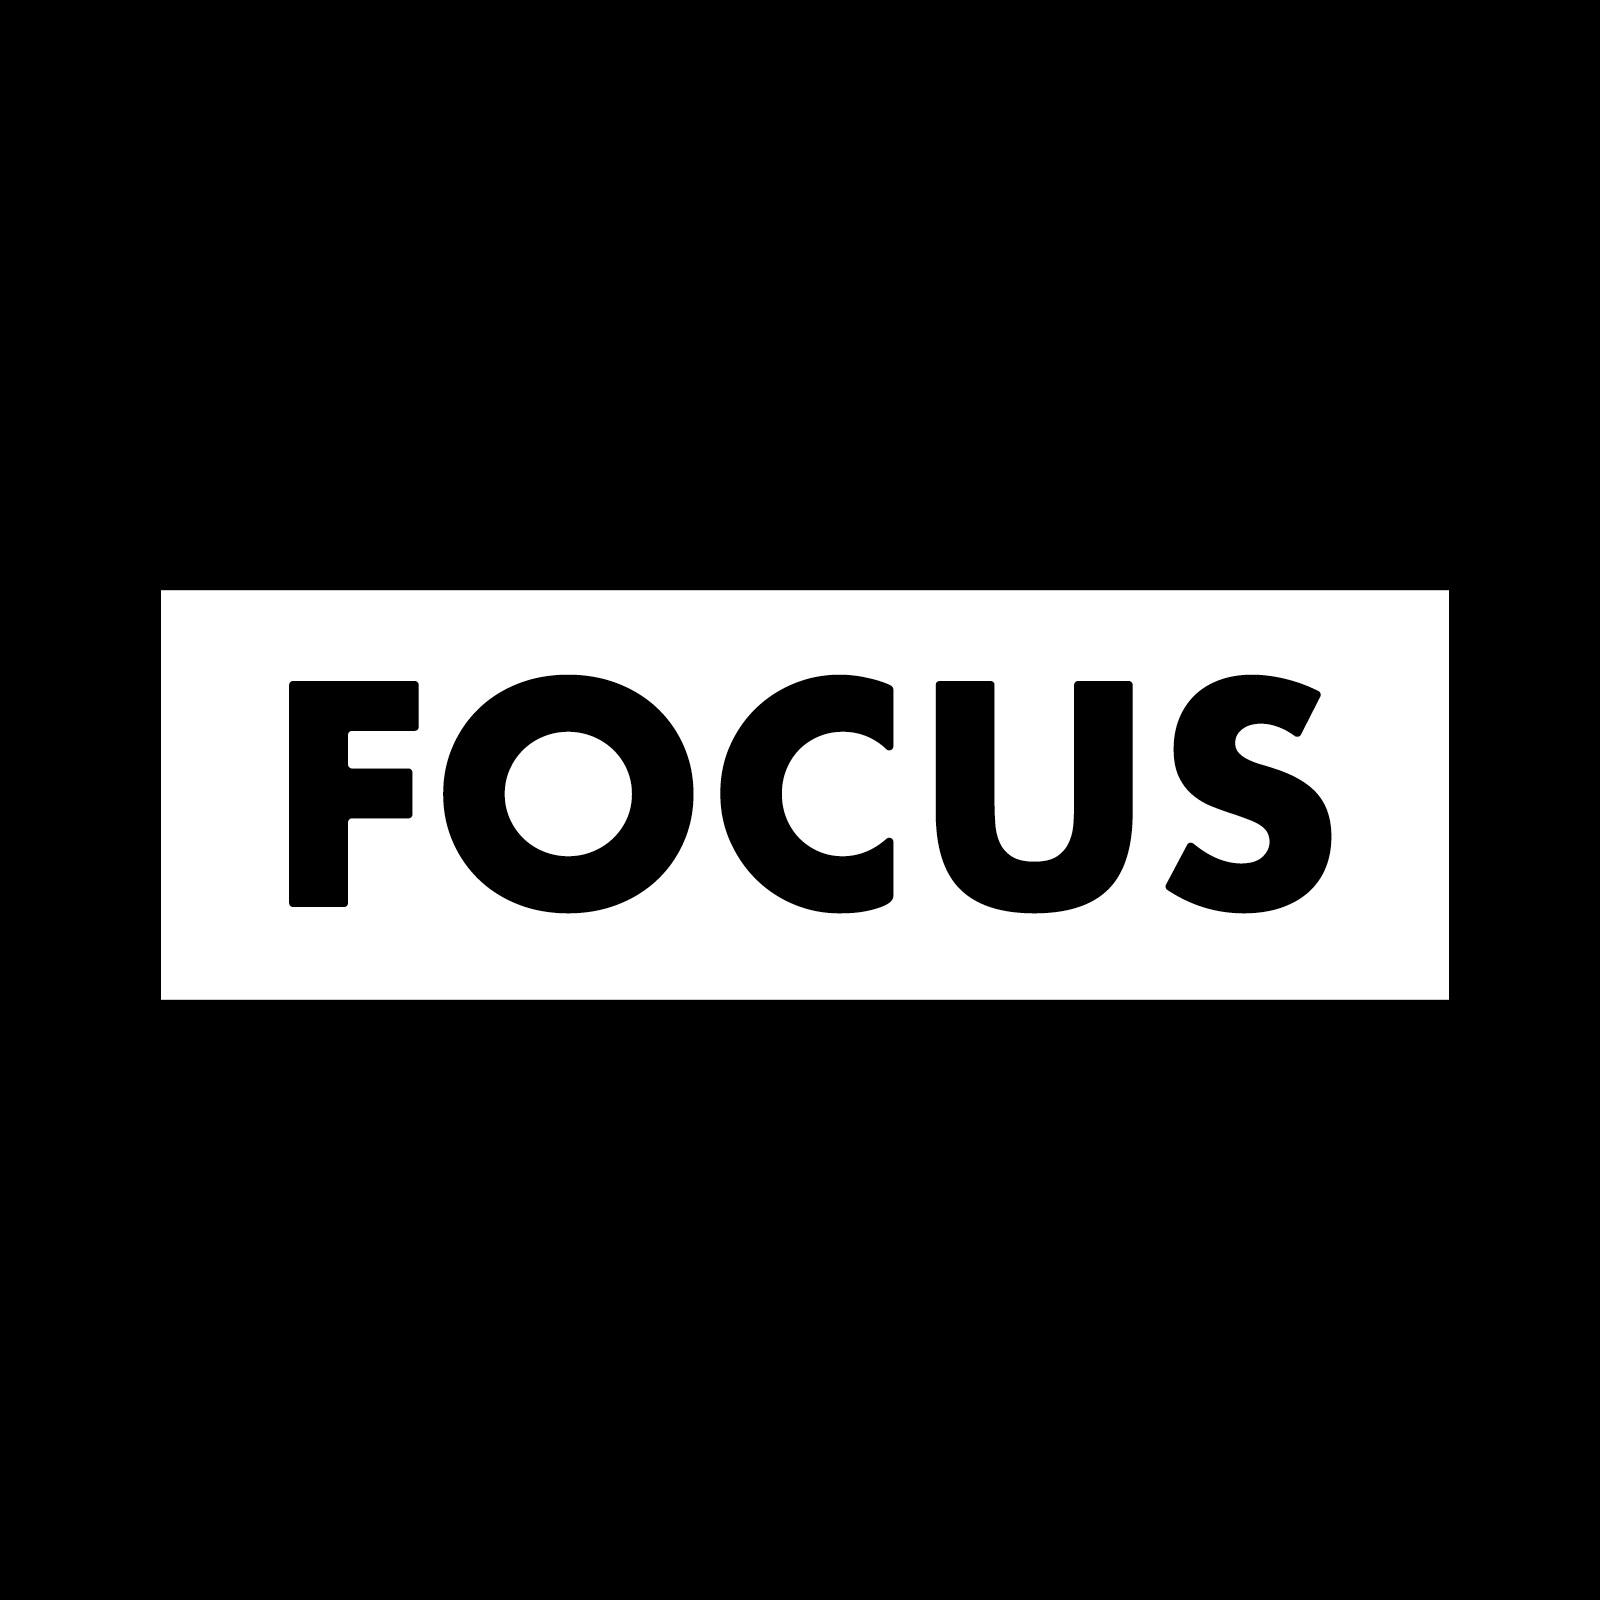 Focus festival logo